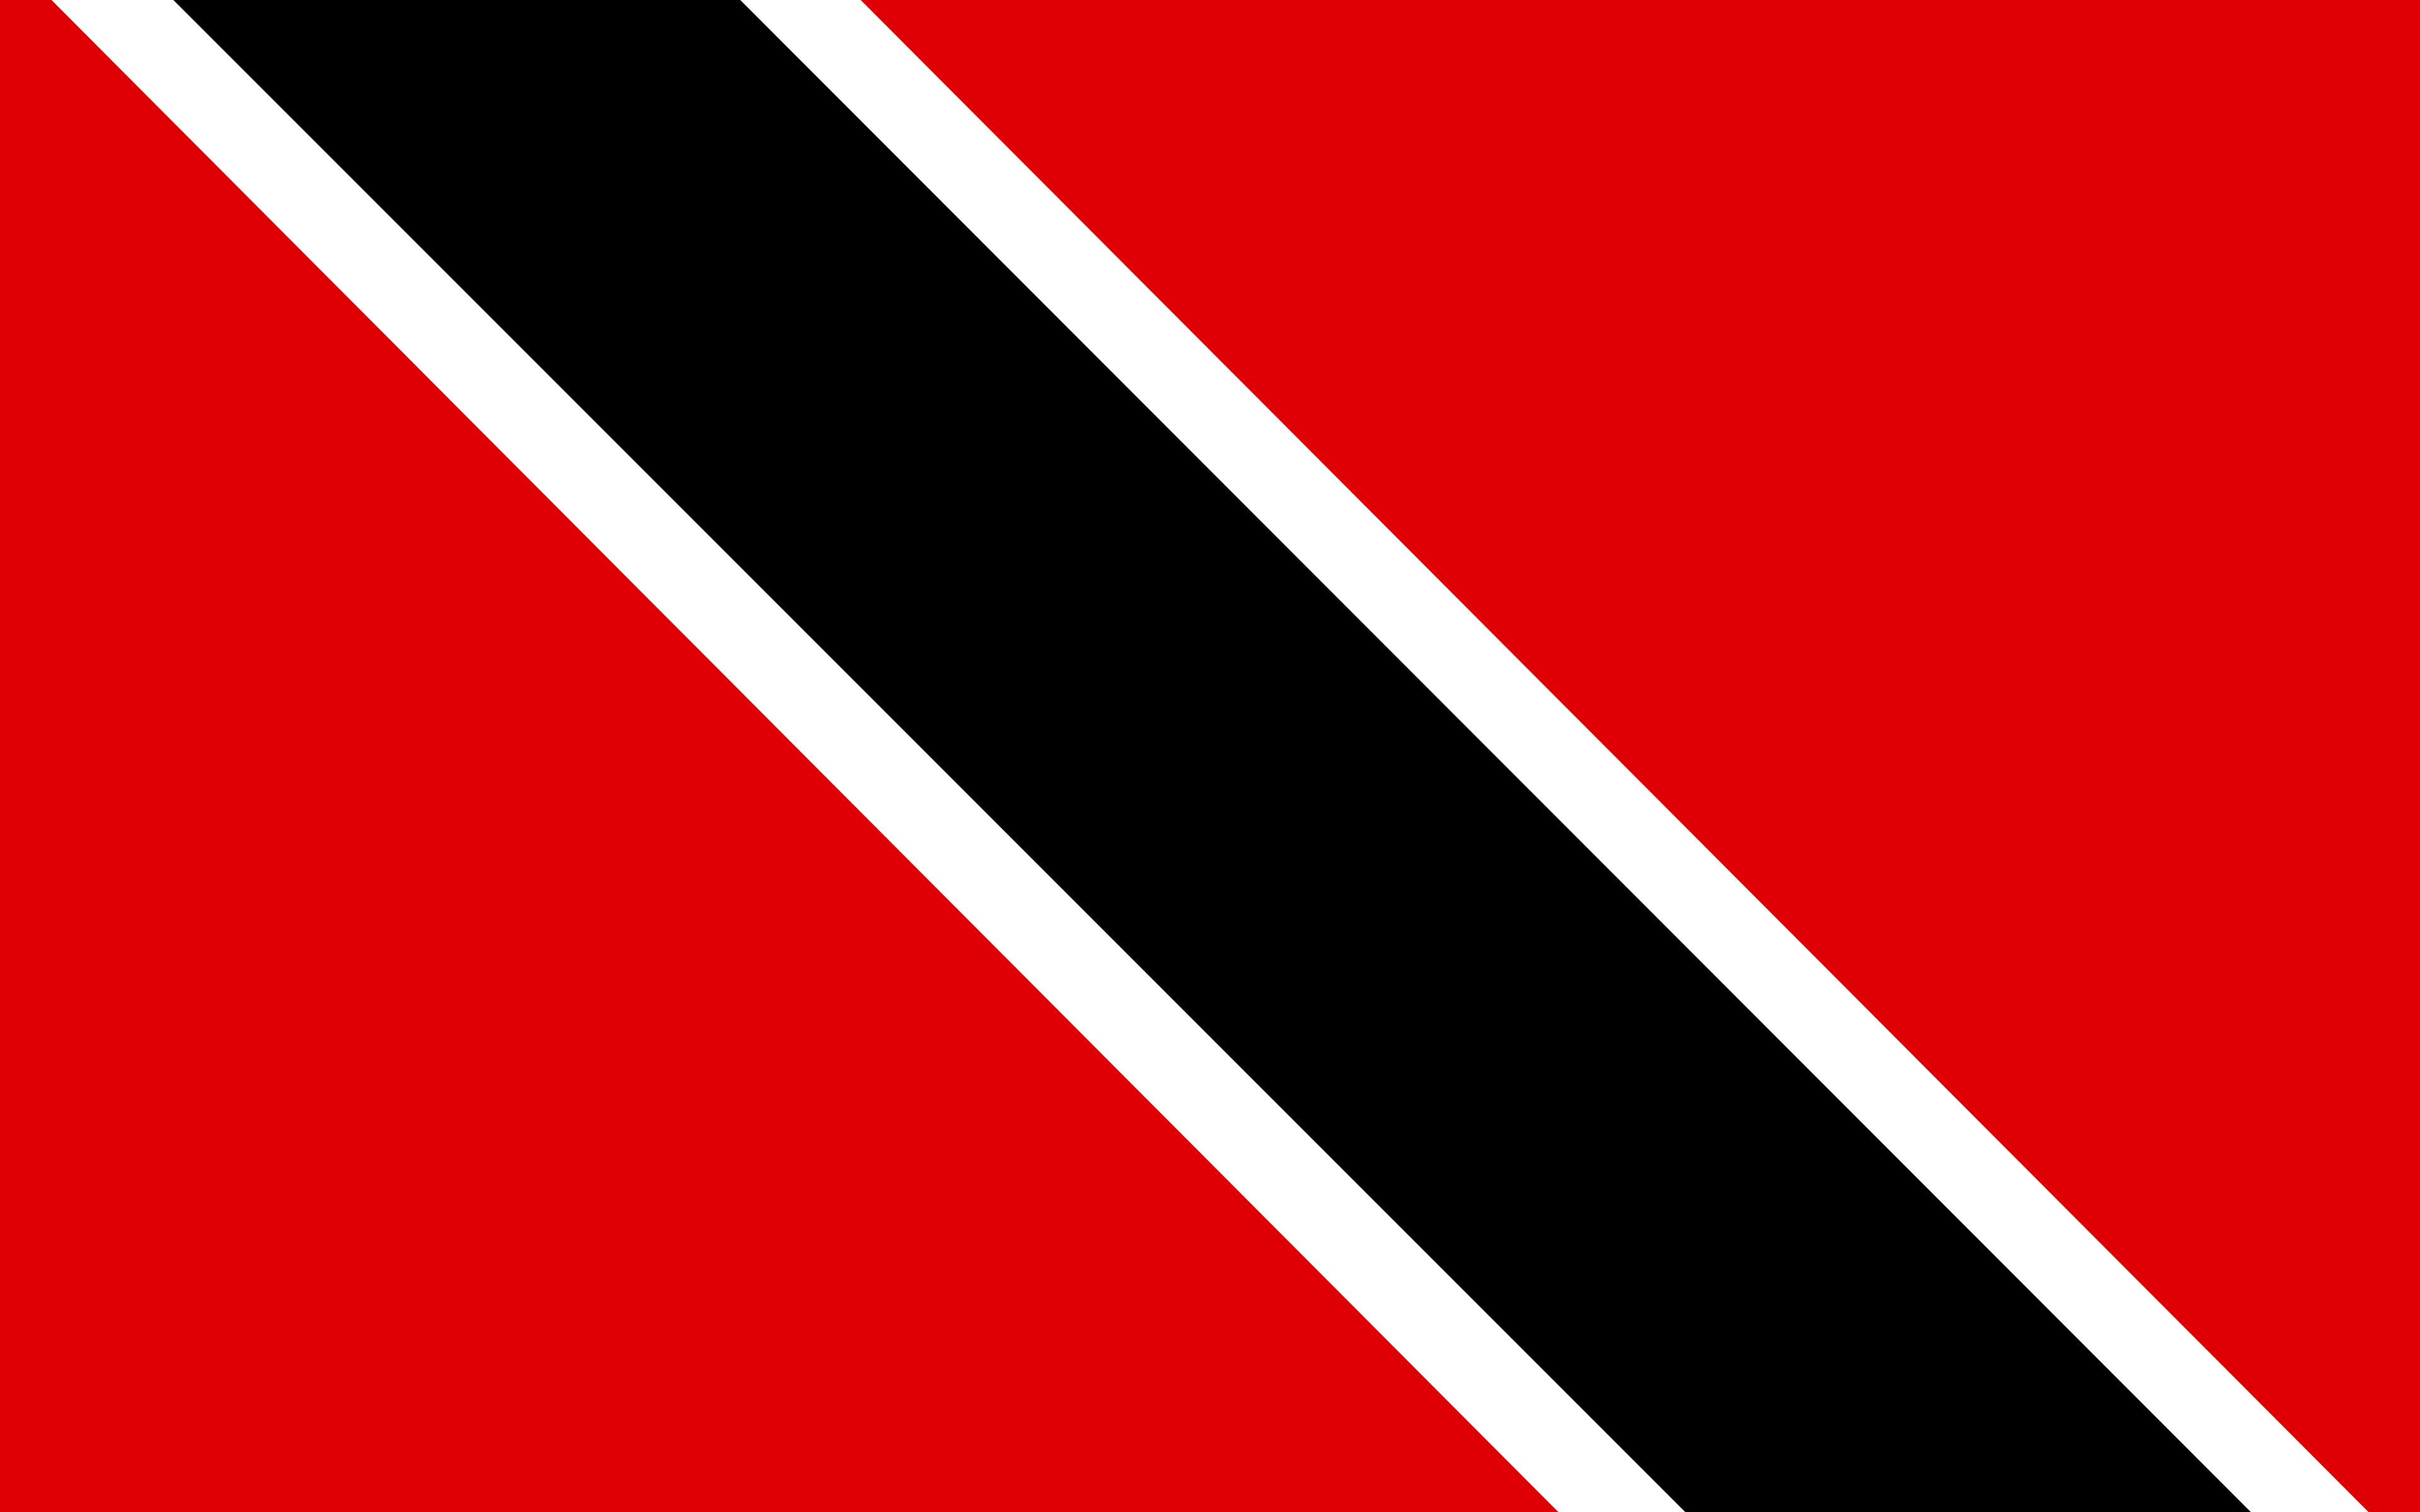 Images Trinidad and Tobago Flag Stripes 3840x2400 3840x2400